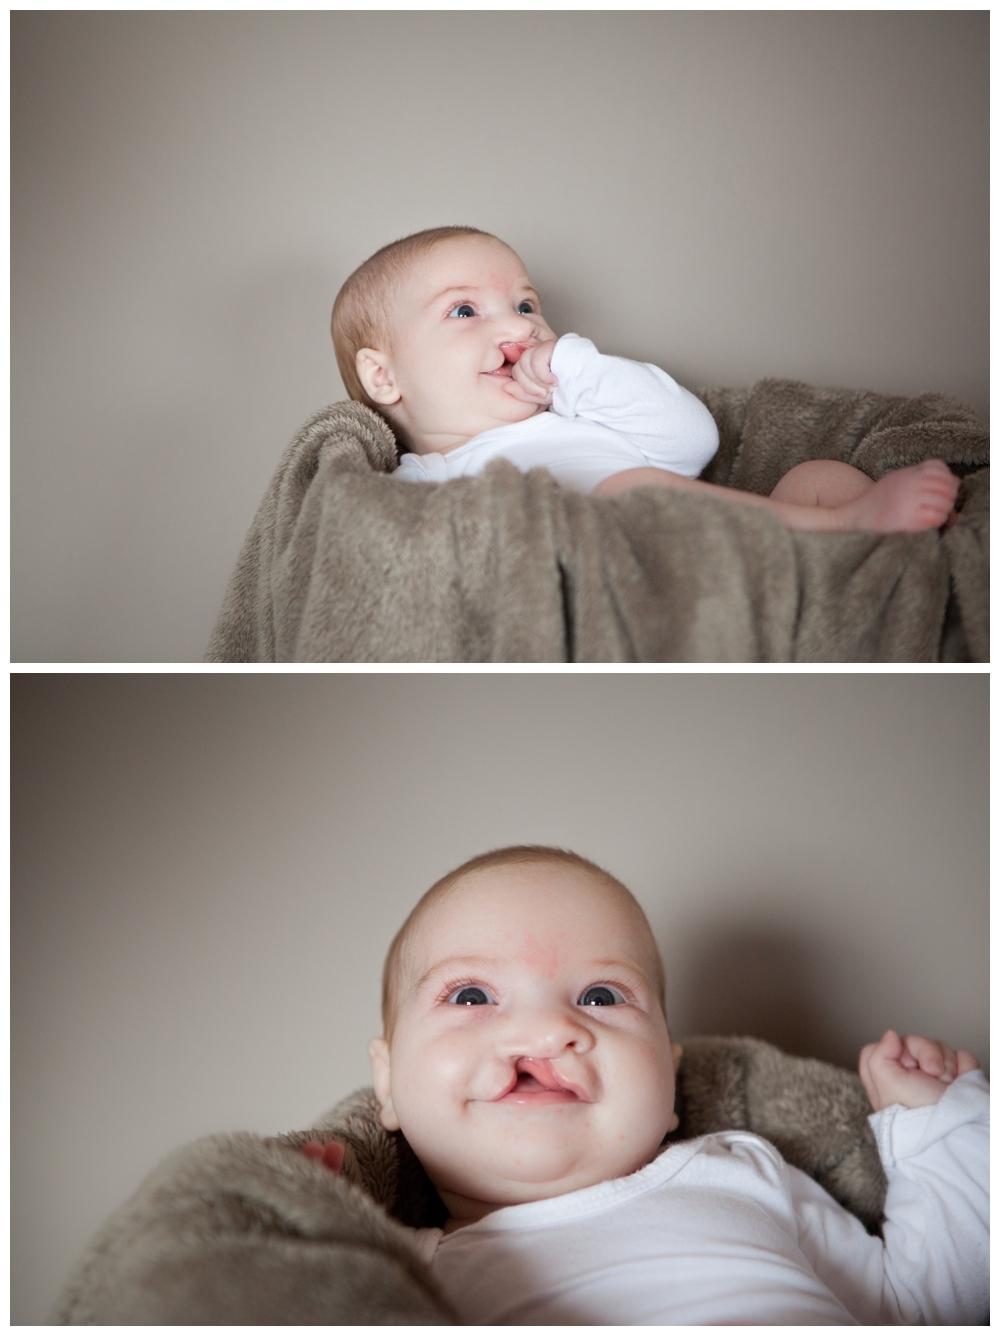 Babyshoot - Lotte - Debora Yari Fotografie05.jpg